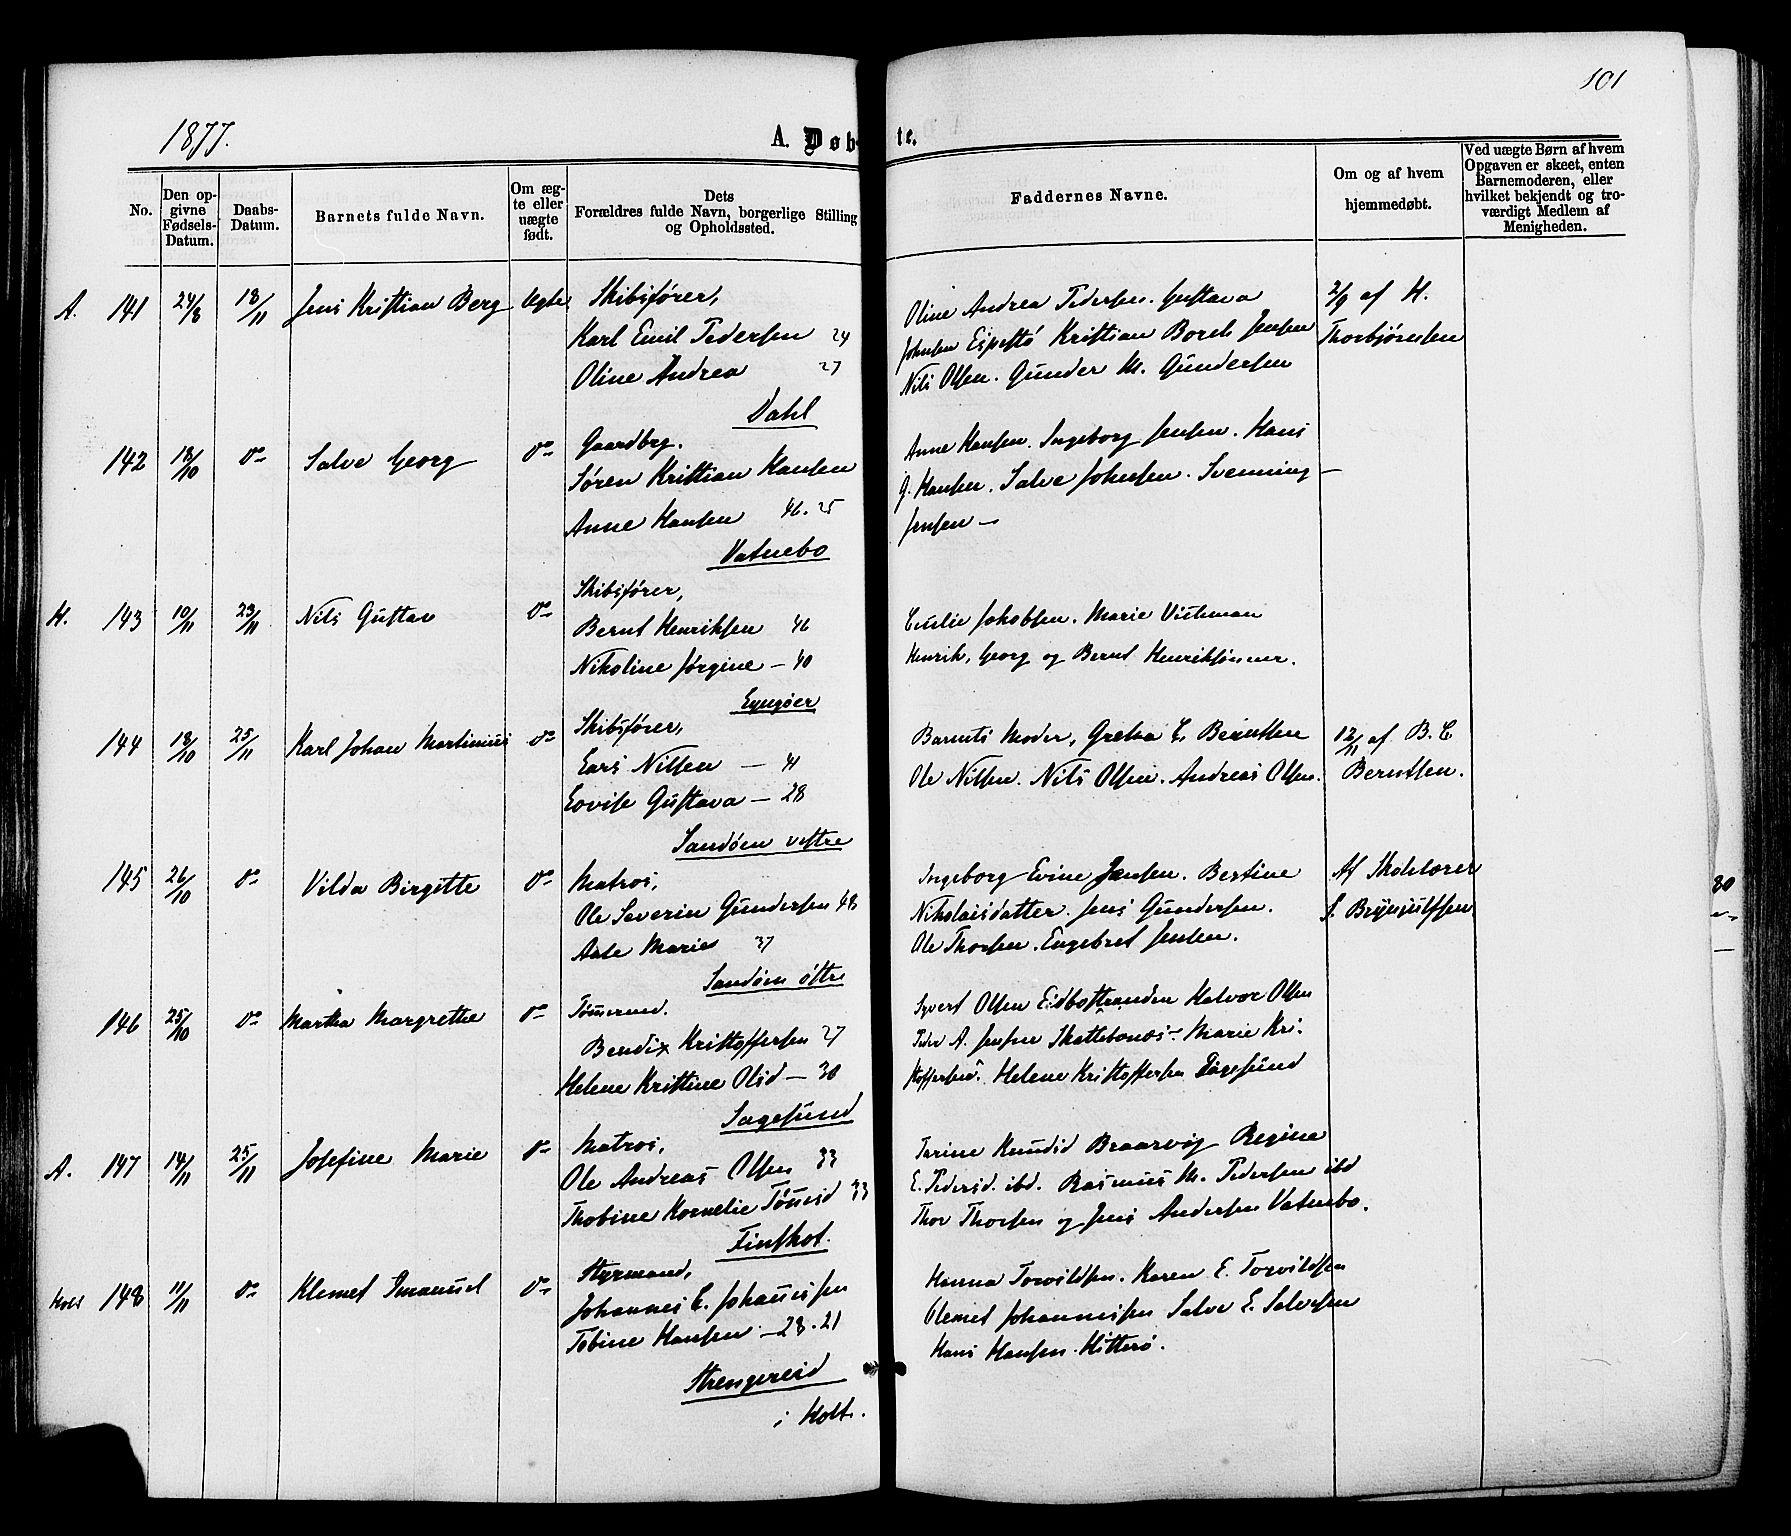 SAK, Dypvåg sokneprestkontor, F/Fa/Faa/L0007: Ministerialbok nr. A 7/ 1, 1872-1884, s. 101